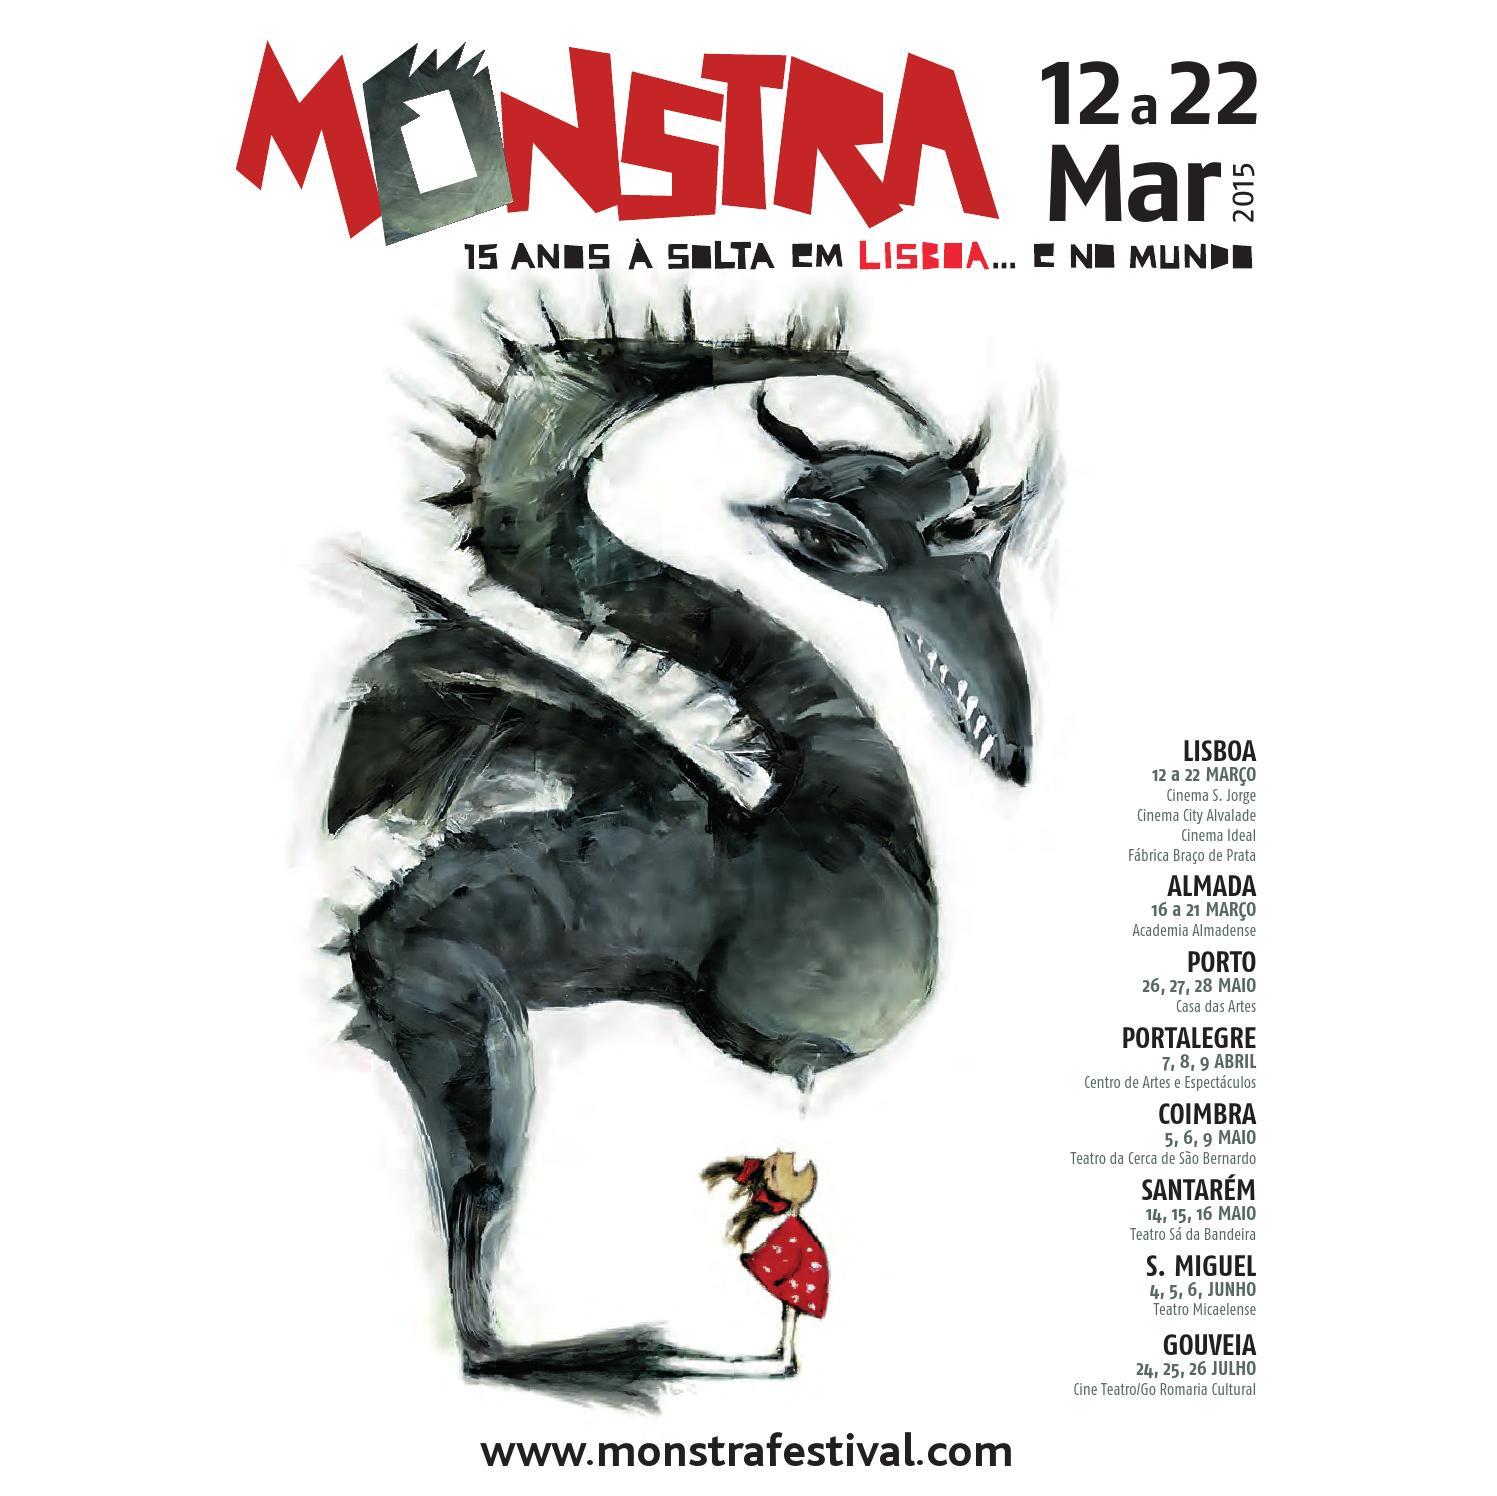 1612f4b034c Catálogo MONSTRA 2015 by Jnrepresas - issuu